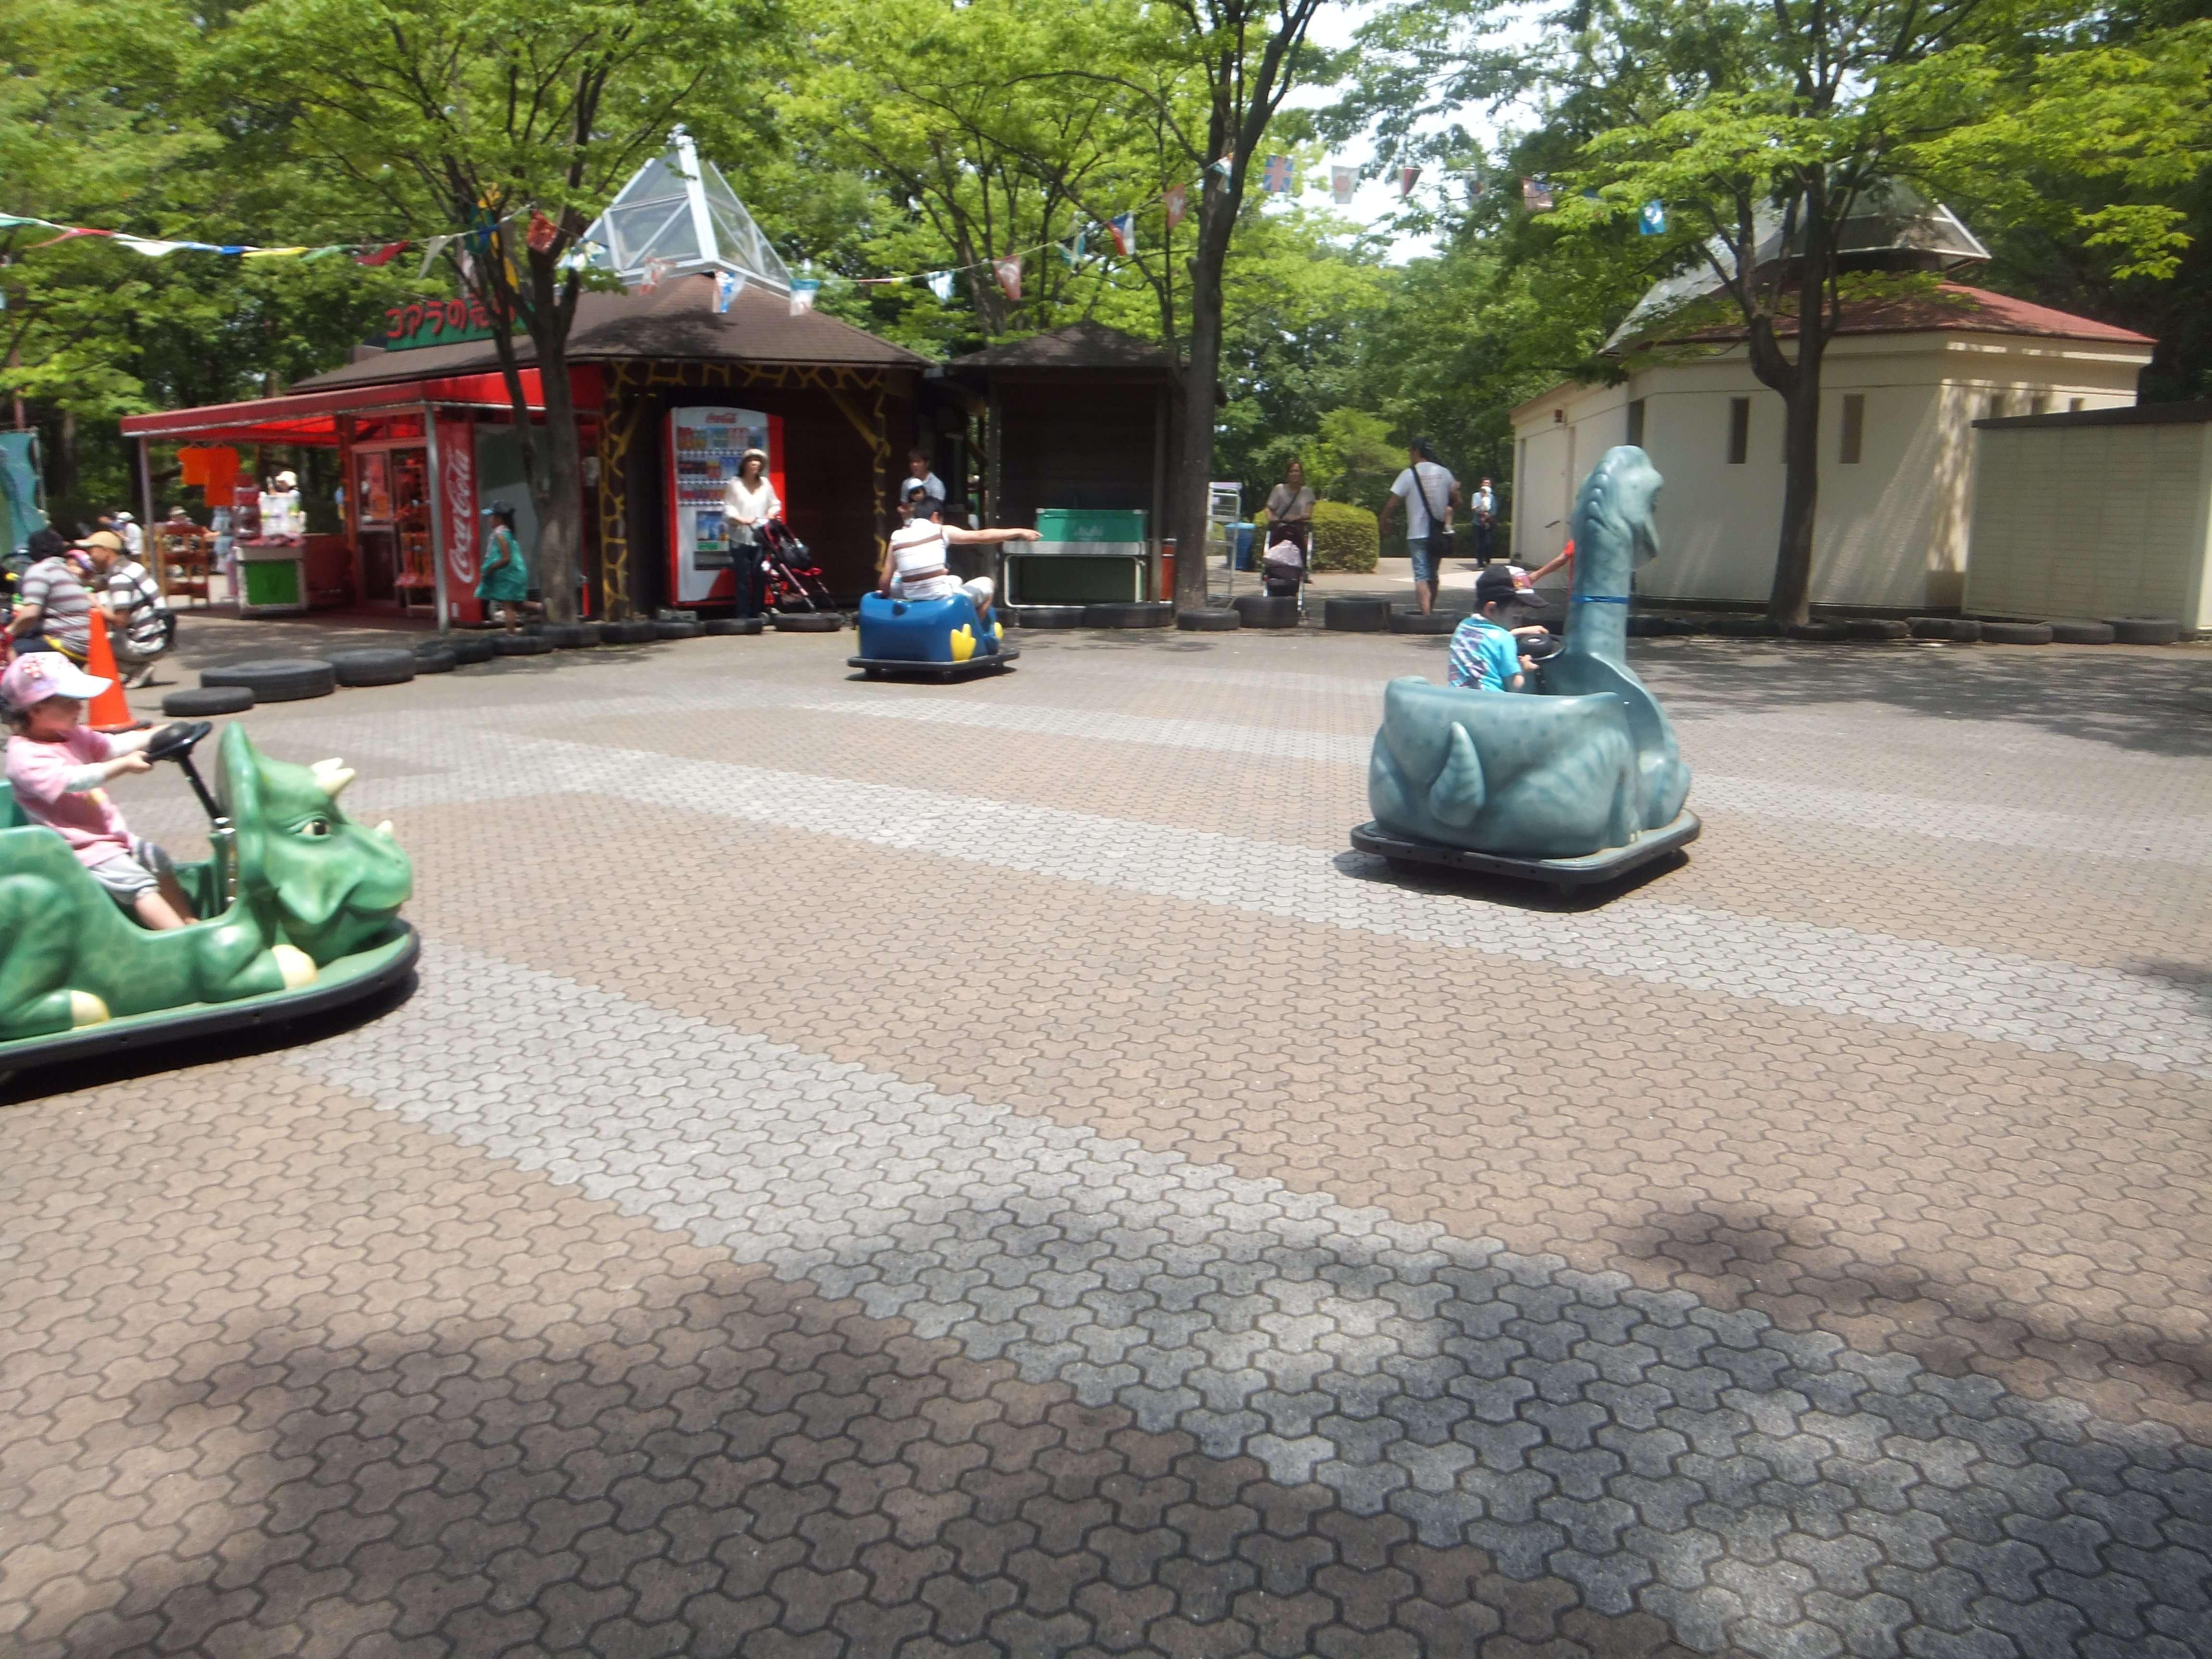 Battery Cars at Saitama Childrens zoo